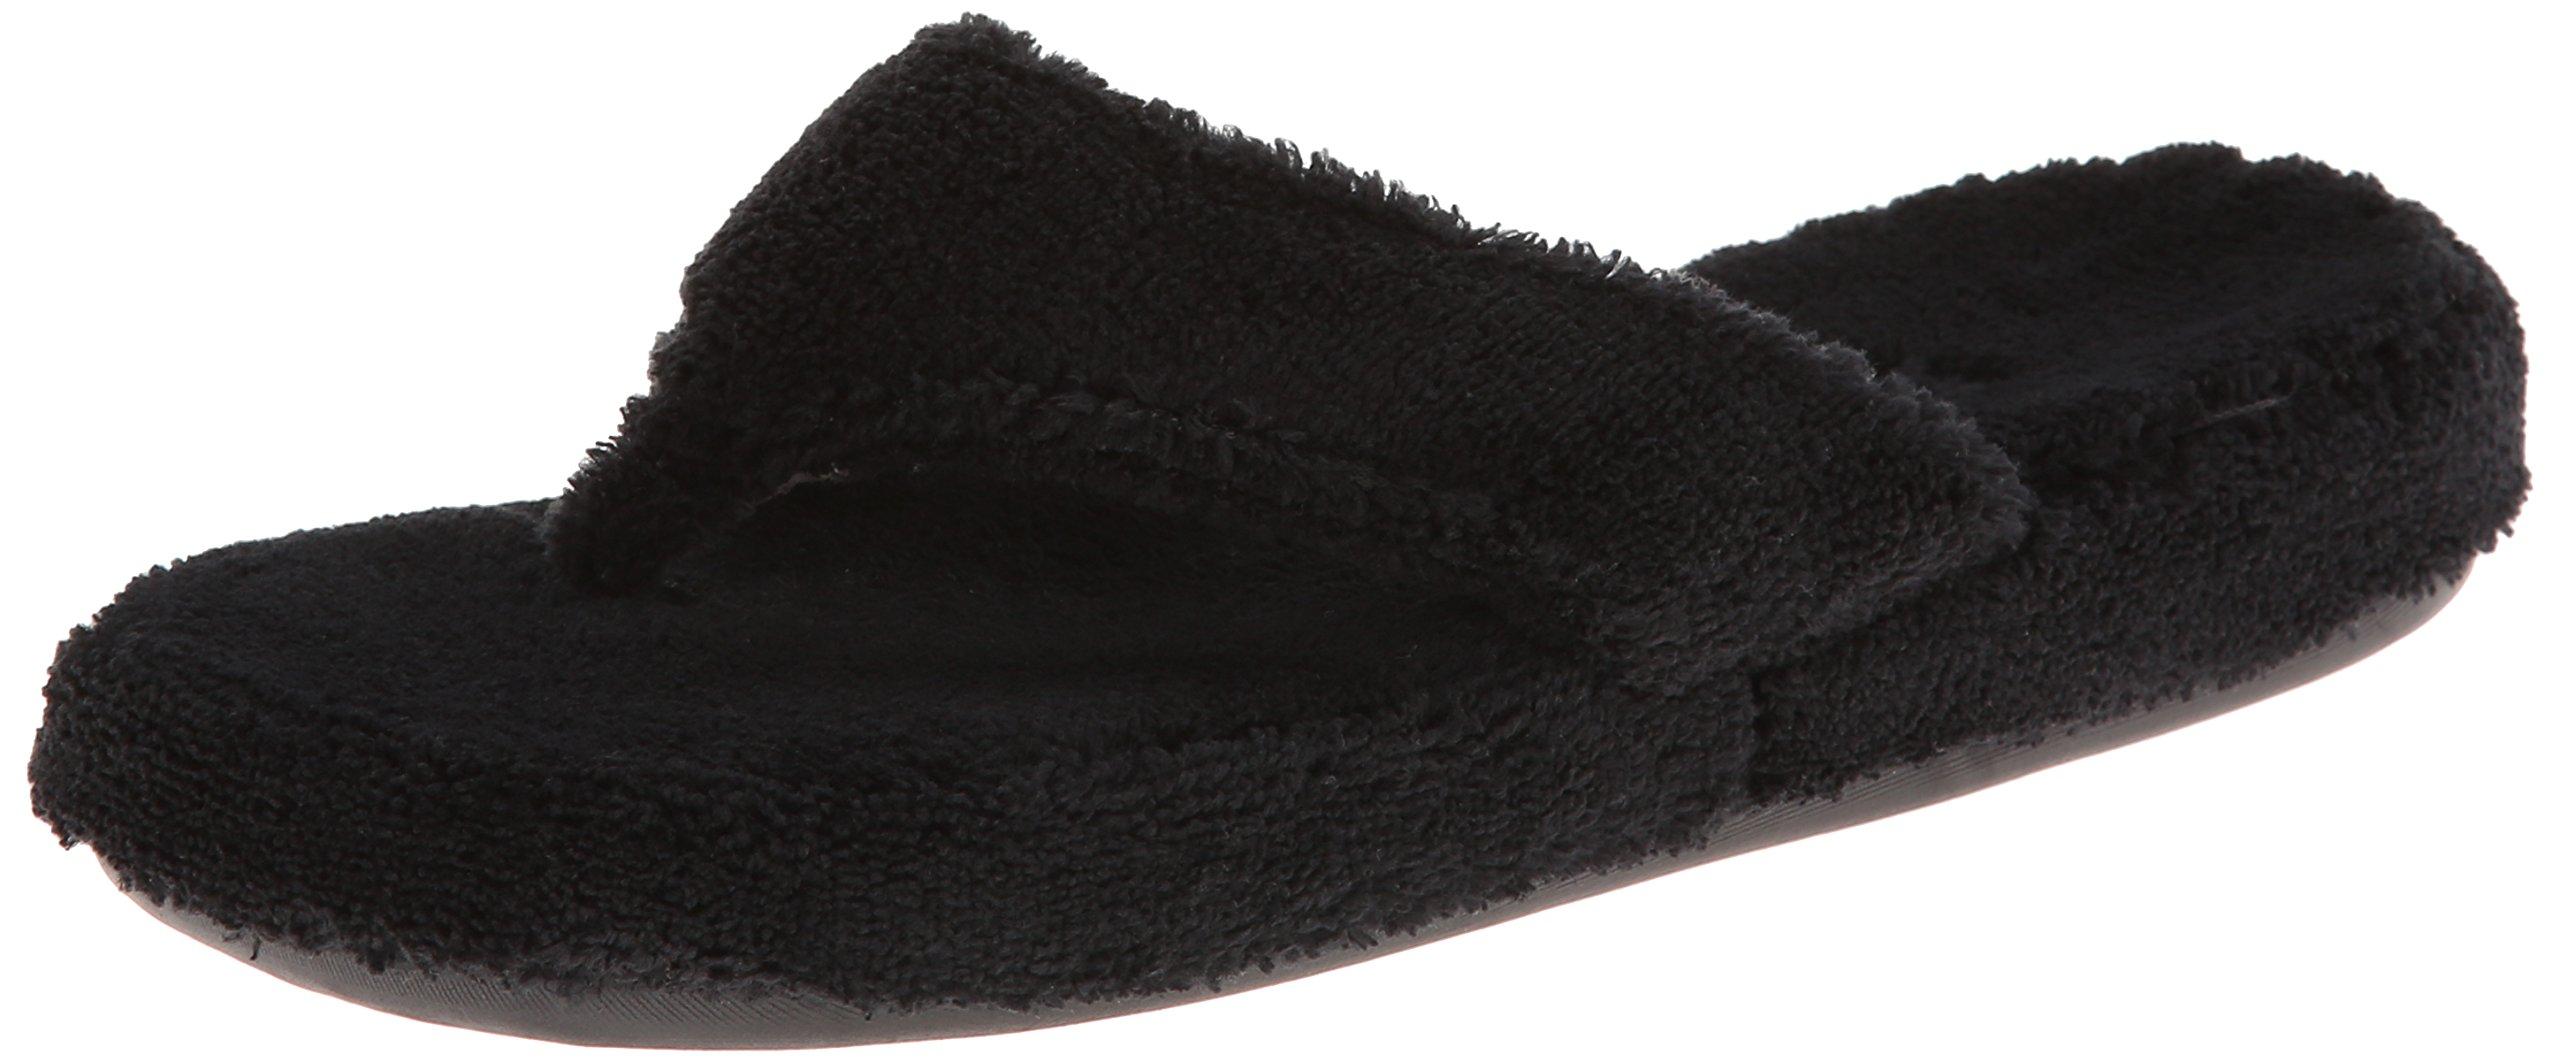 Acorn Women's Spa Thong Slipper, Black, Large / 8-9 B(M) US